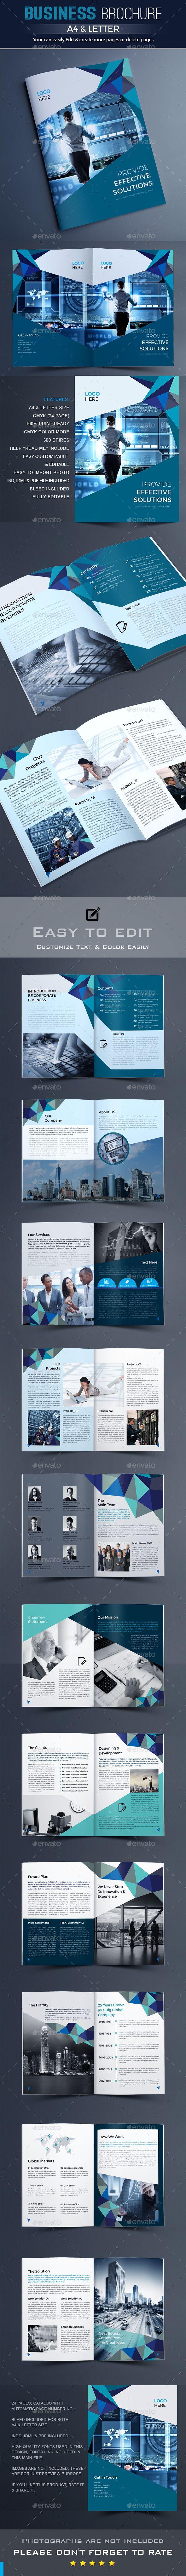 Brochure Template Vector EPS, InDesign INDD, AI Illustrator